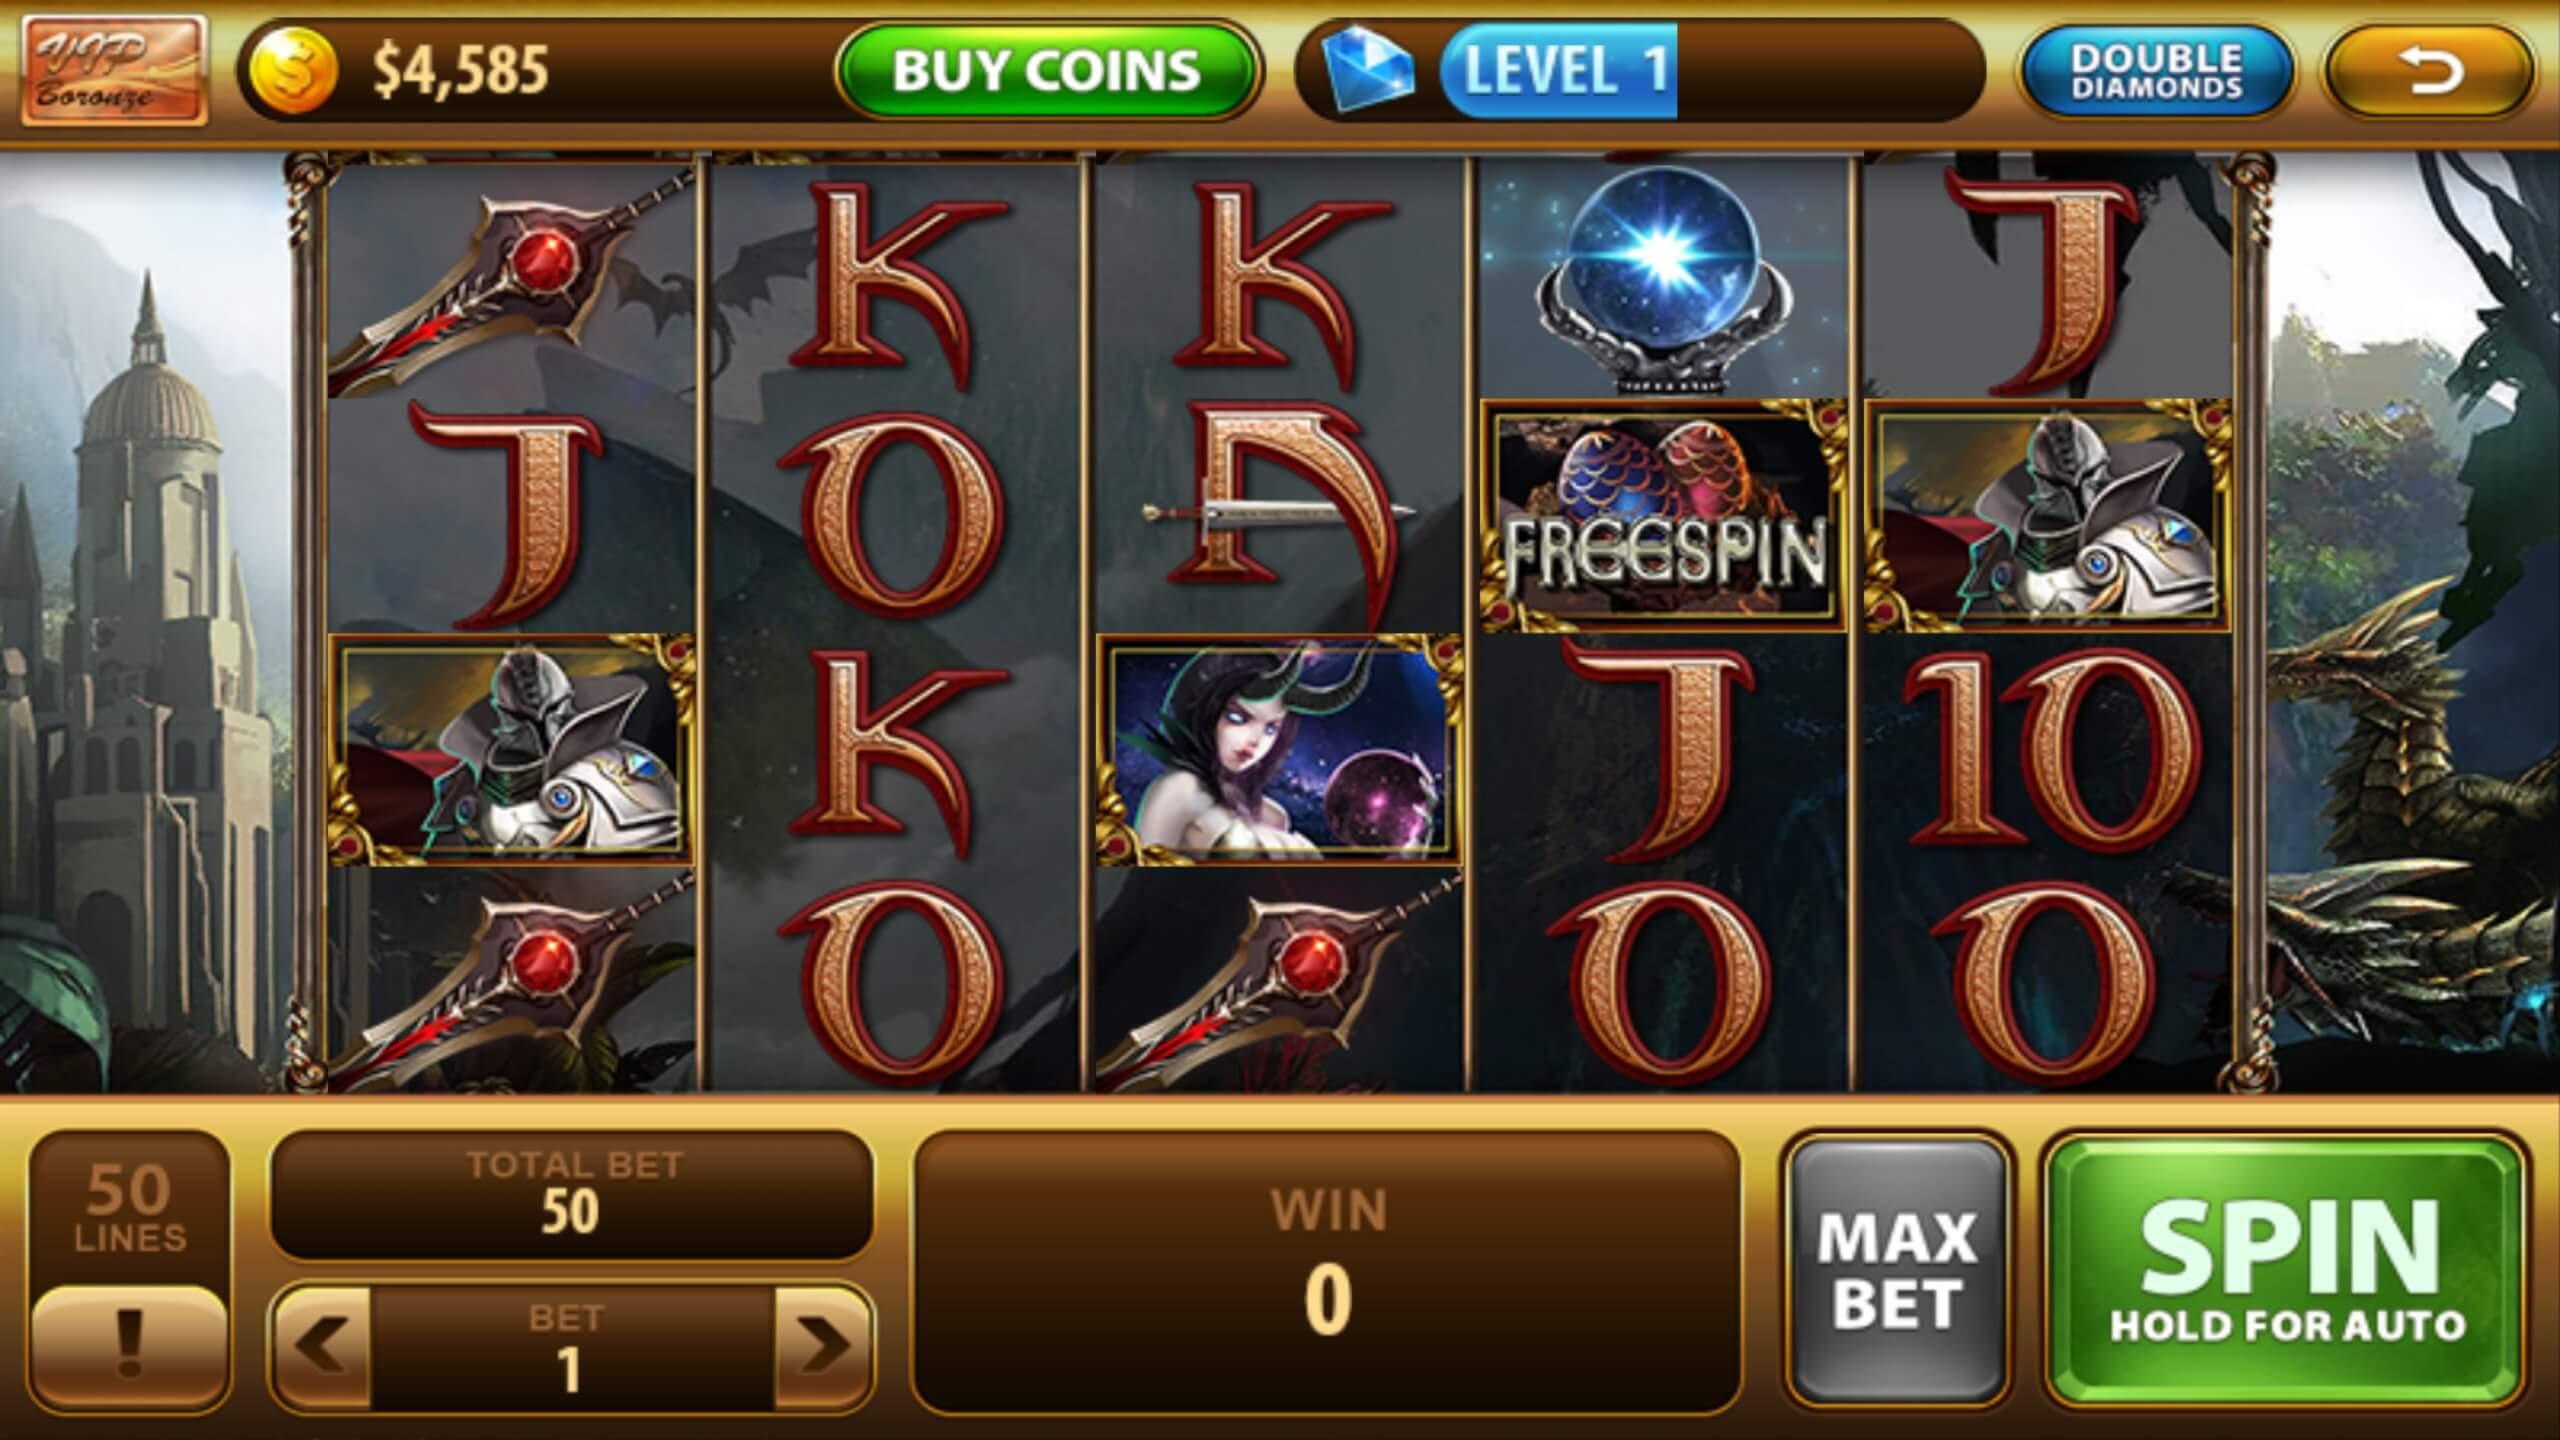 Bingo gambling sites